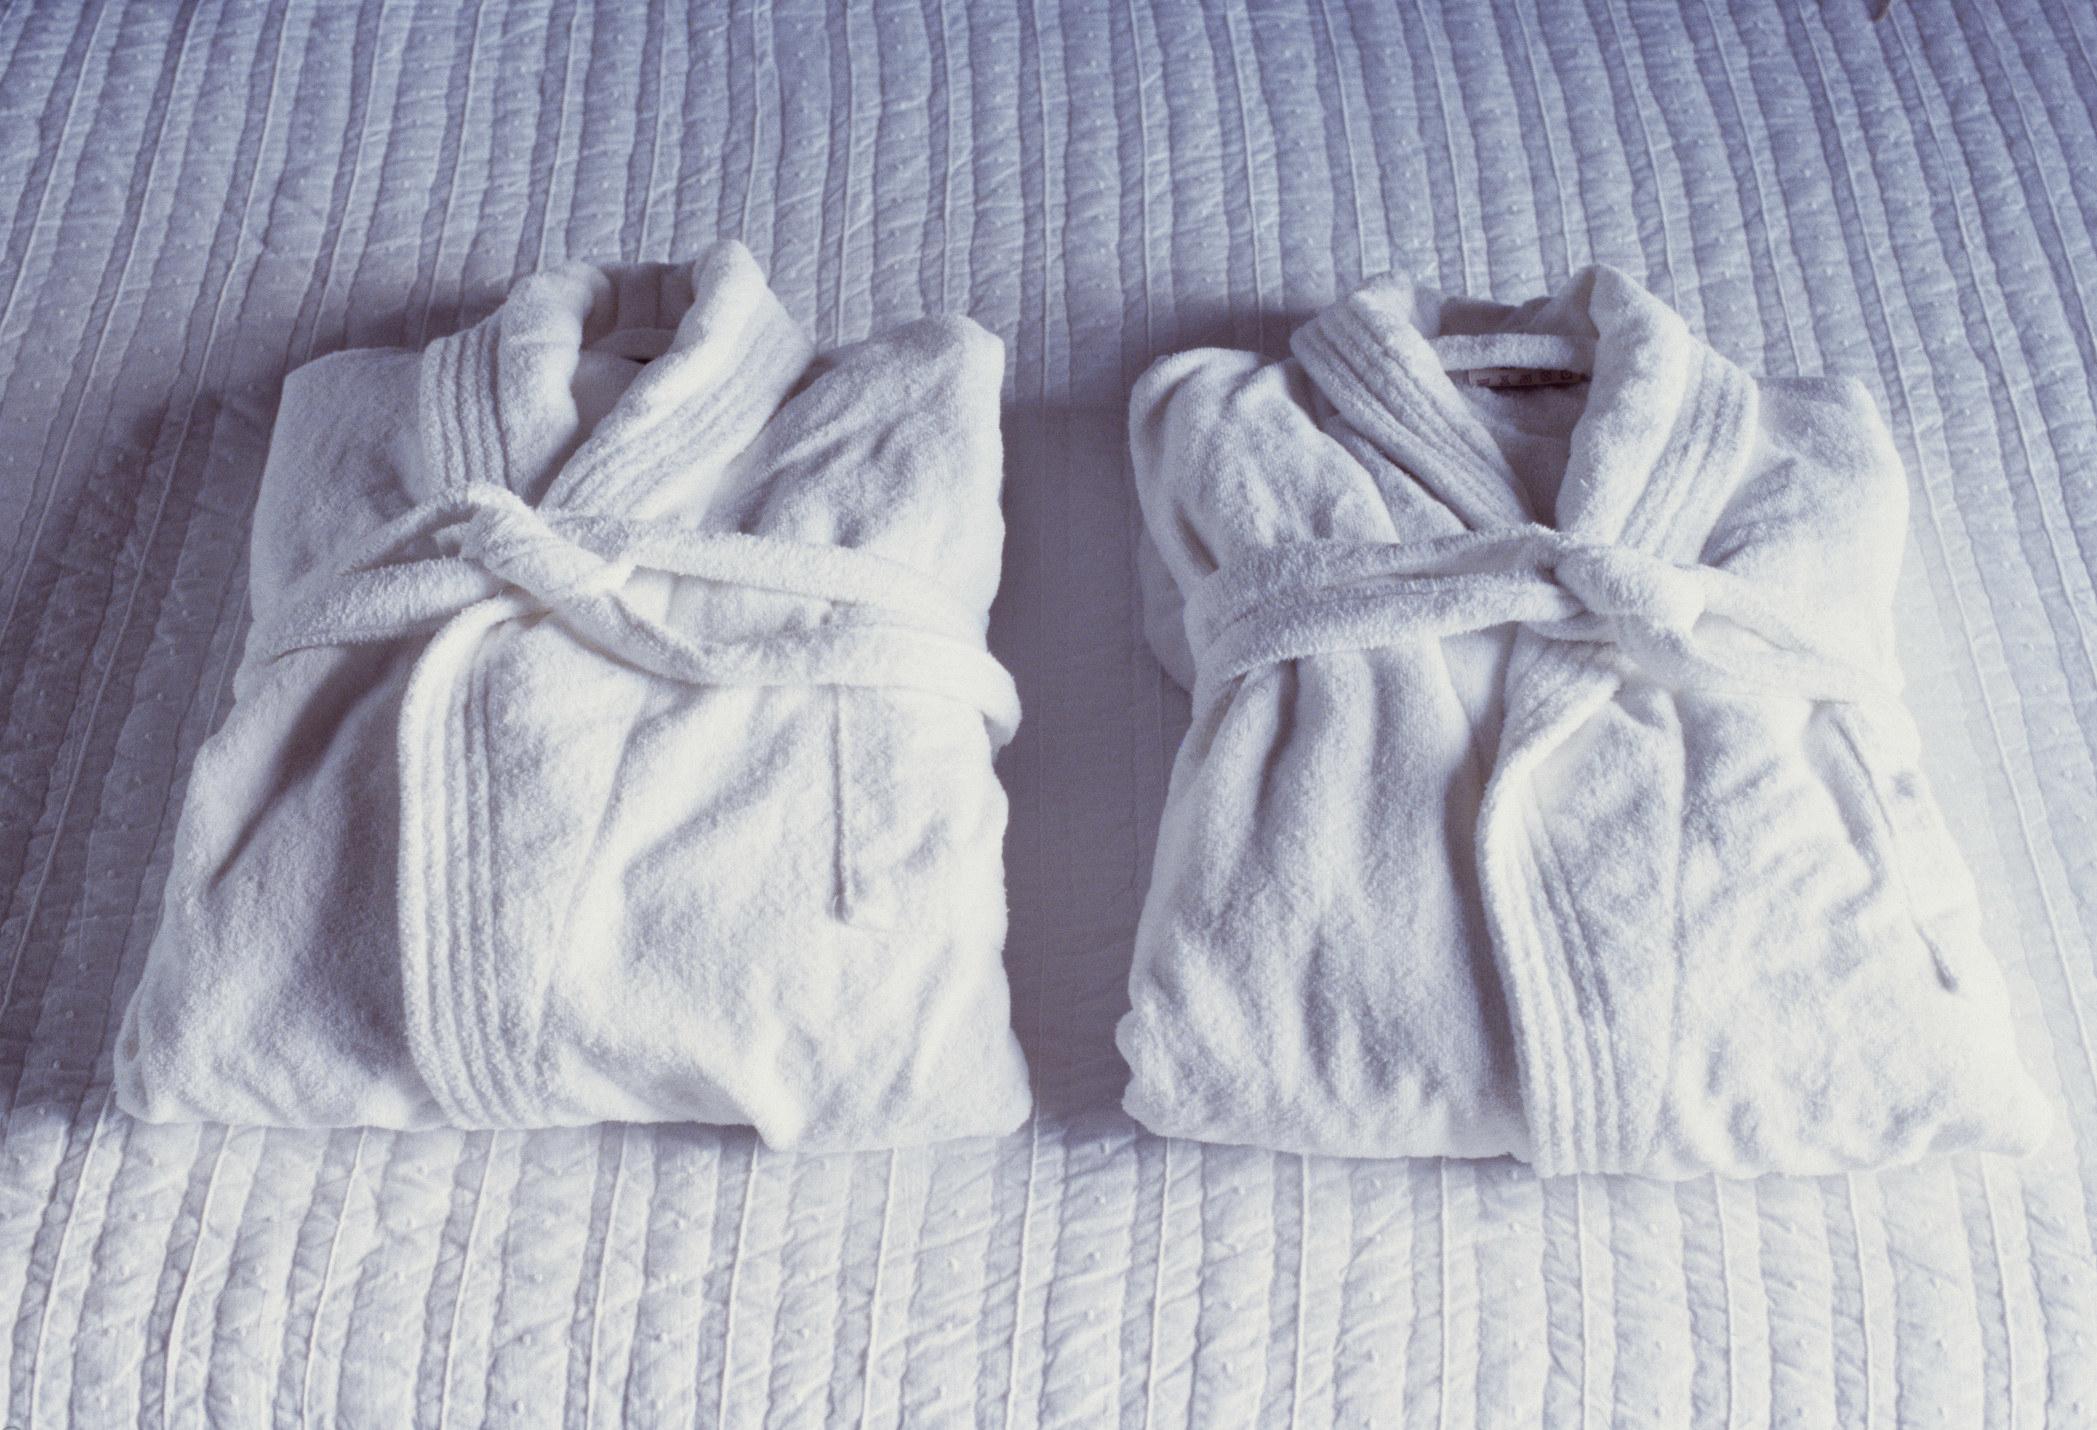 Plush hotel robes